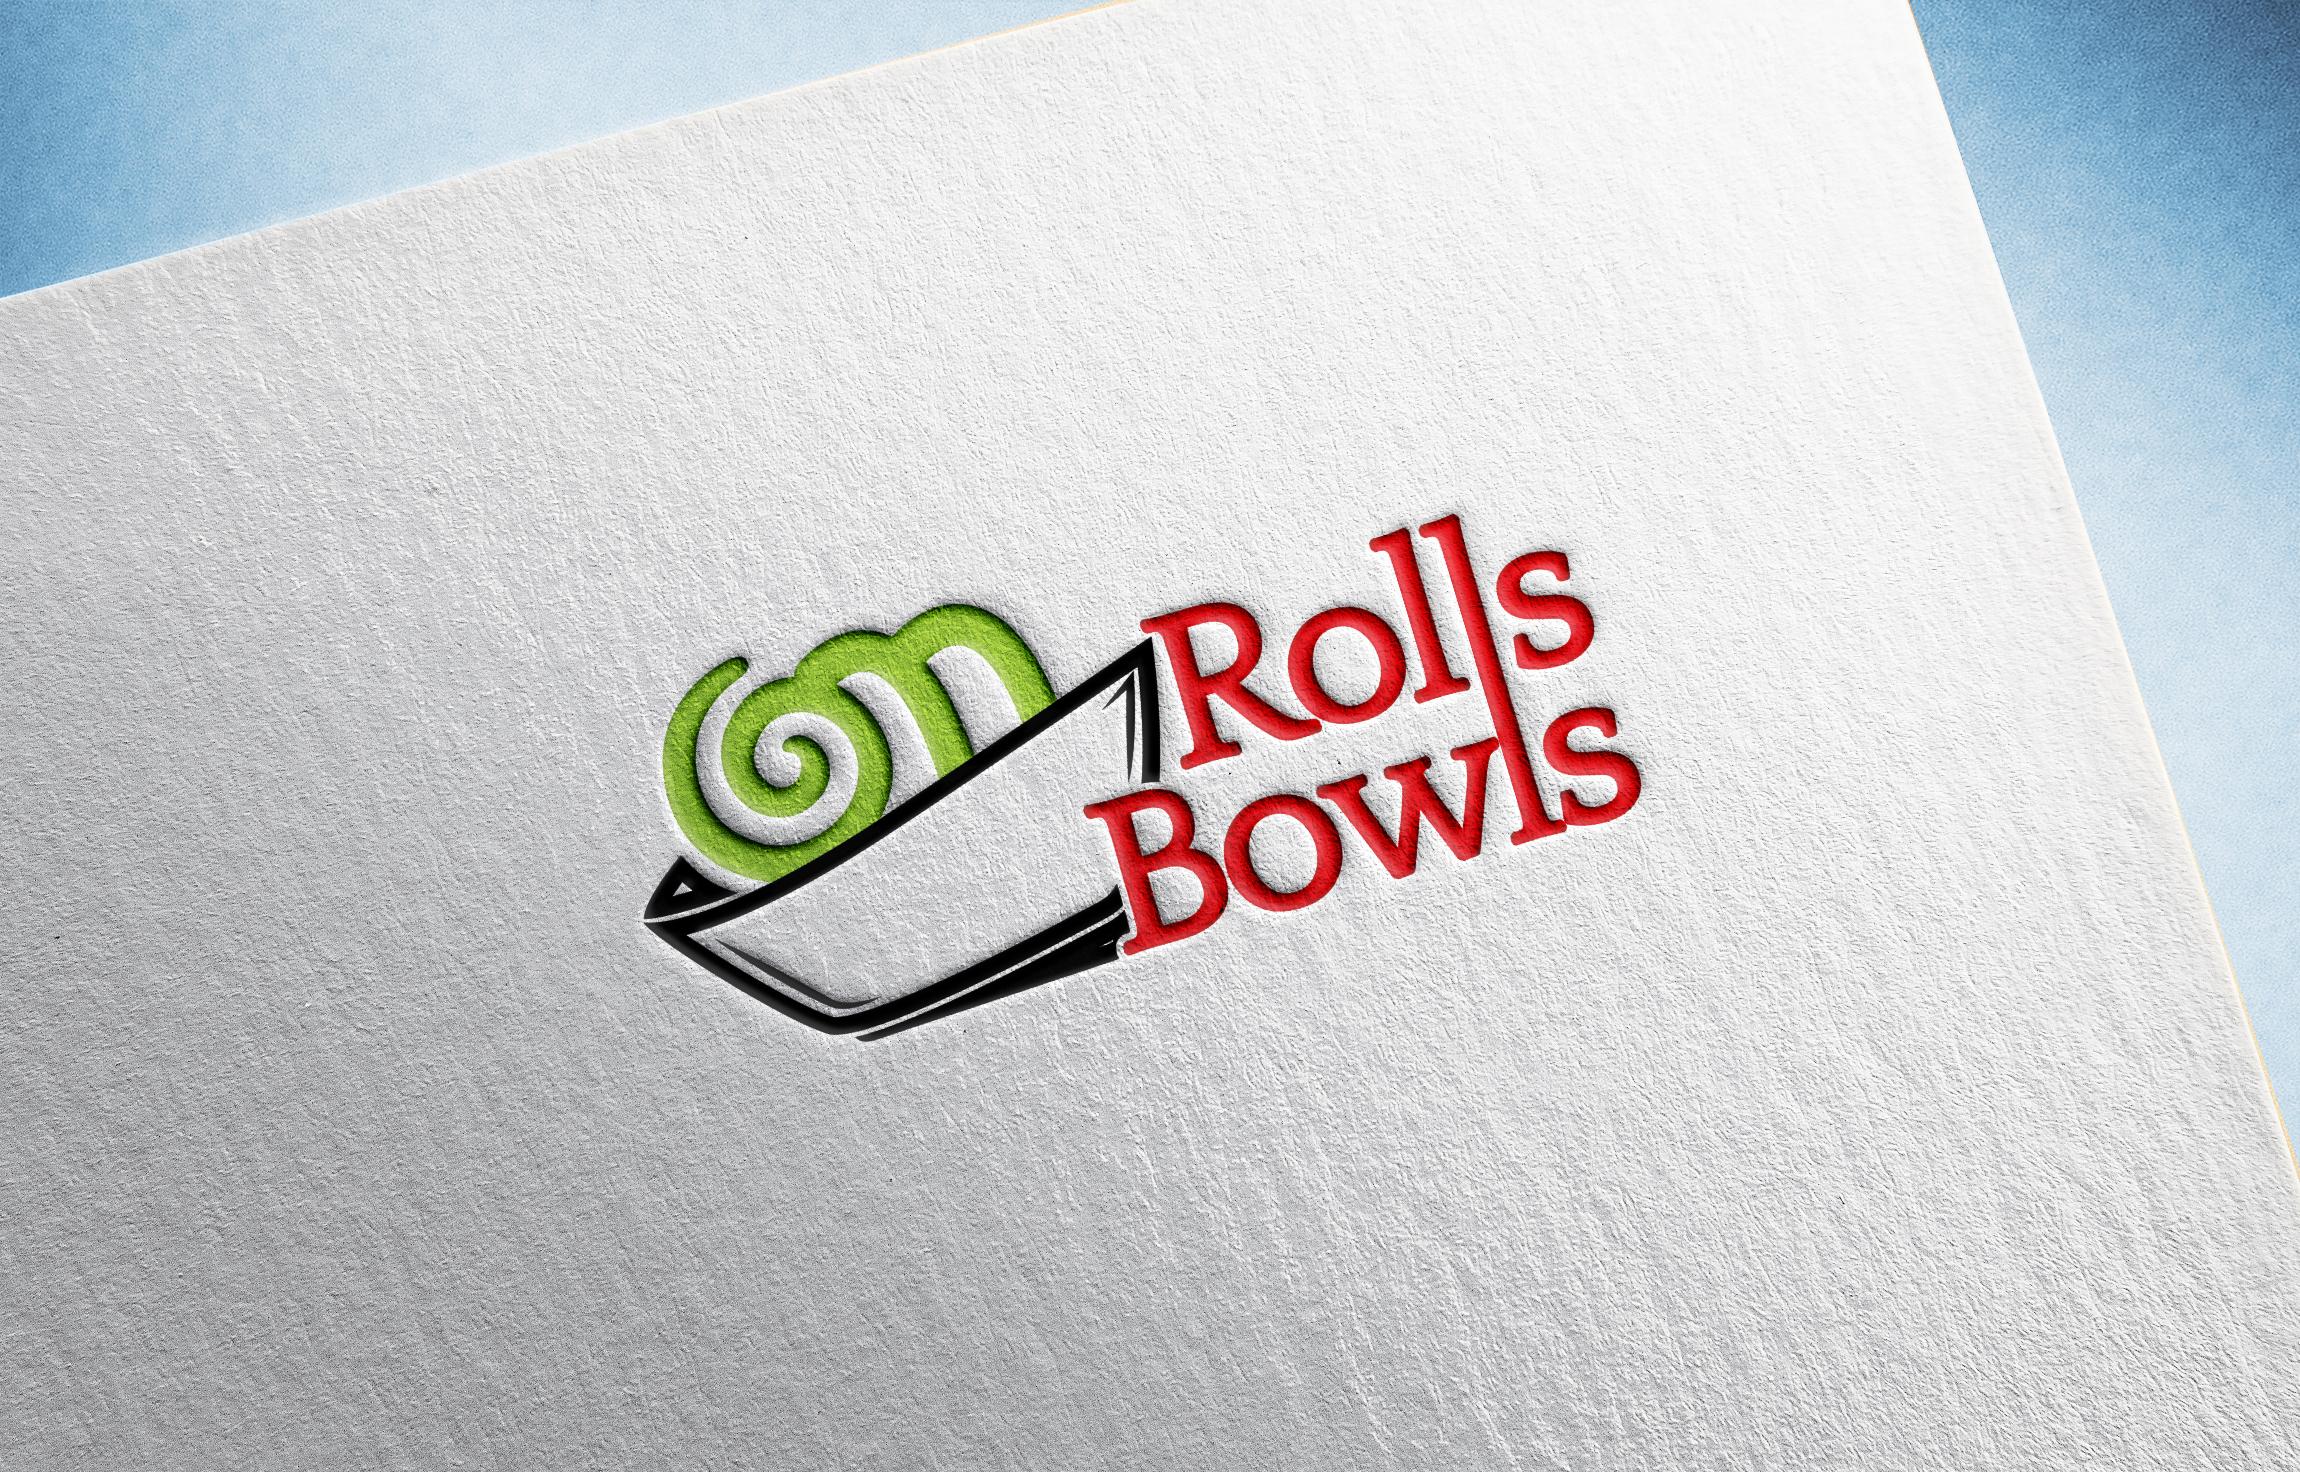 Rolls on Bowls